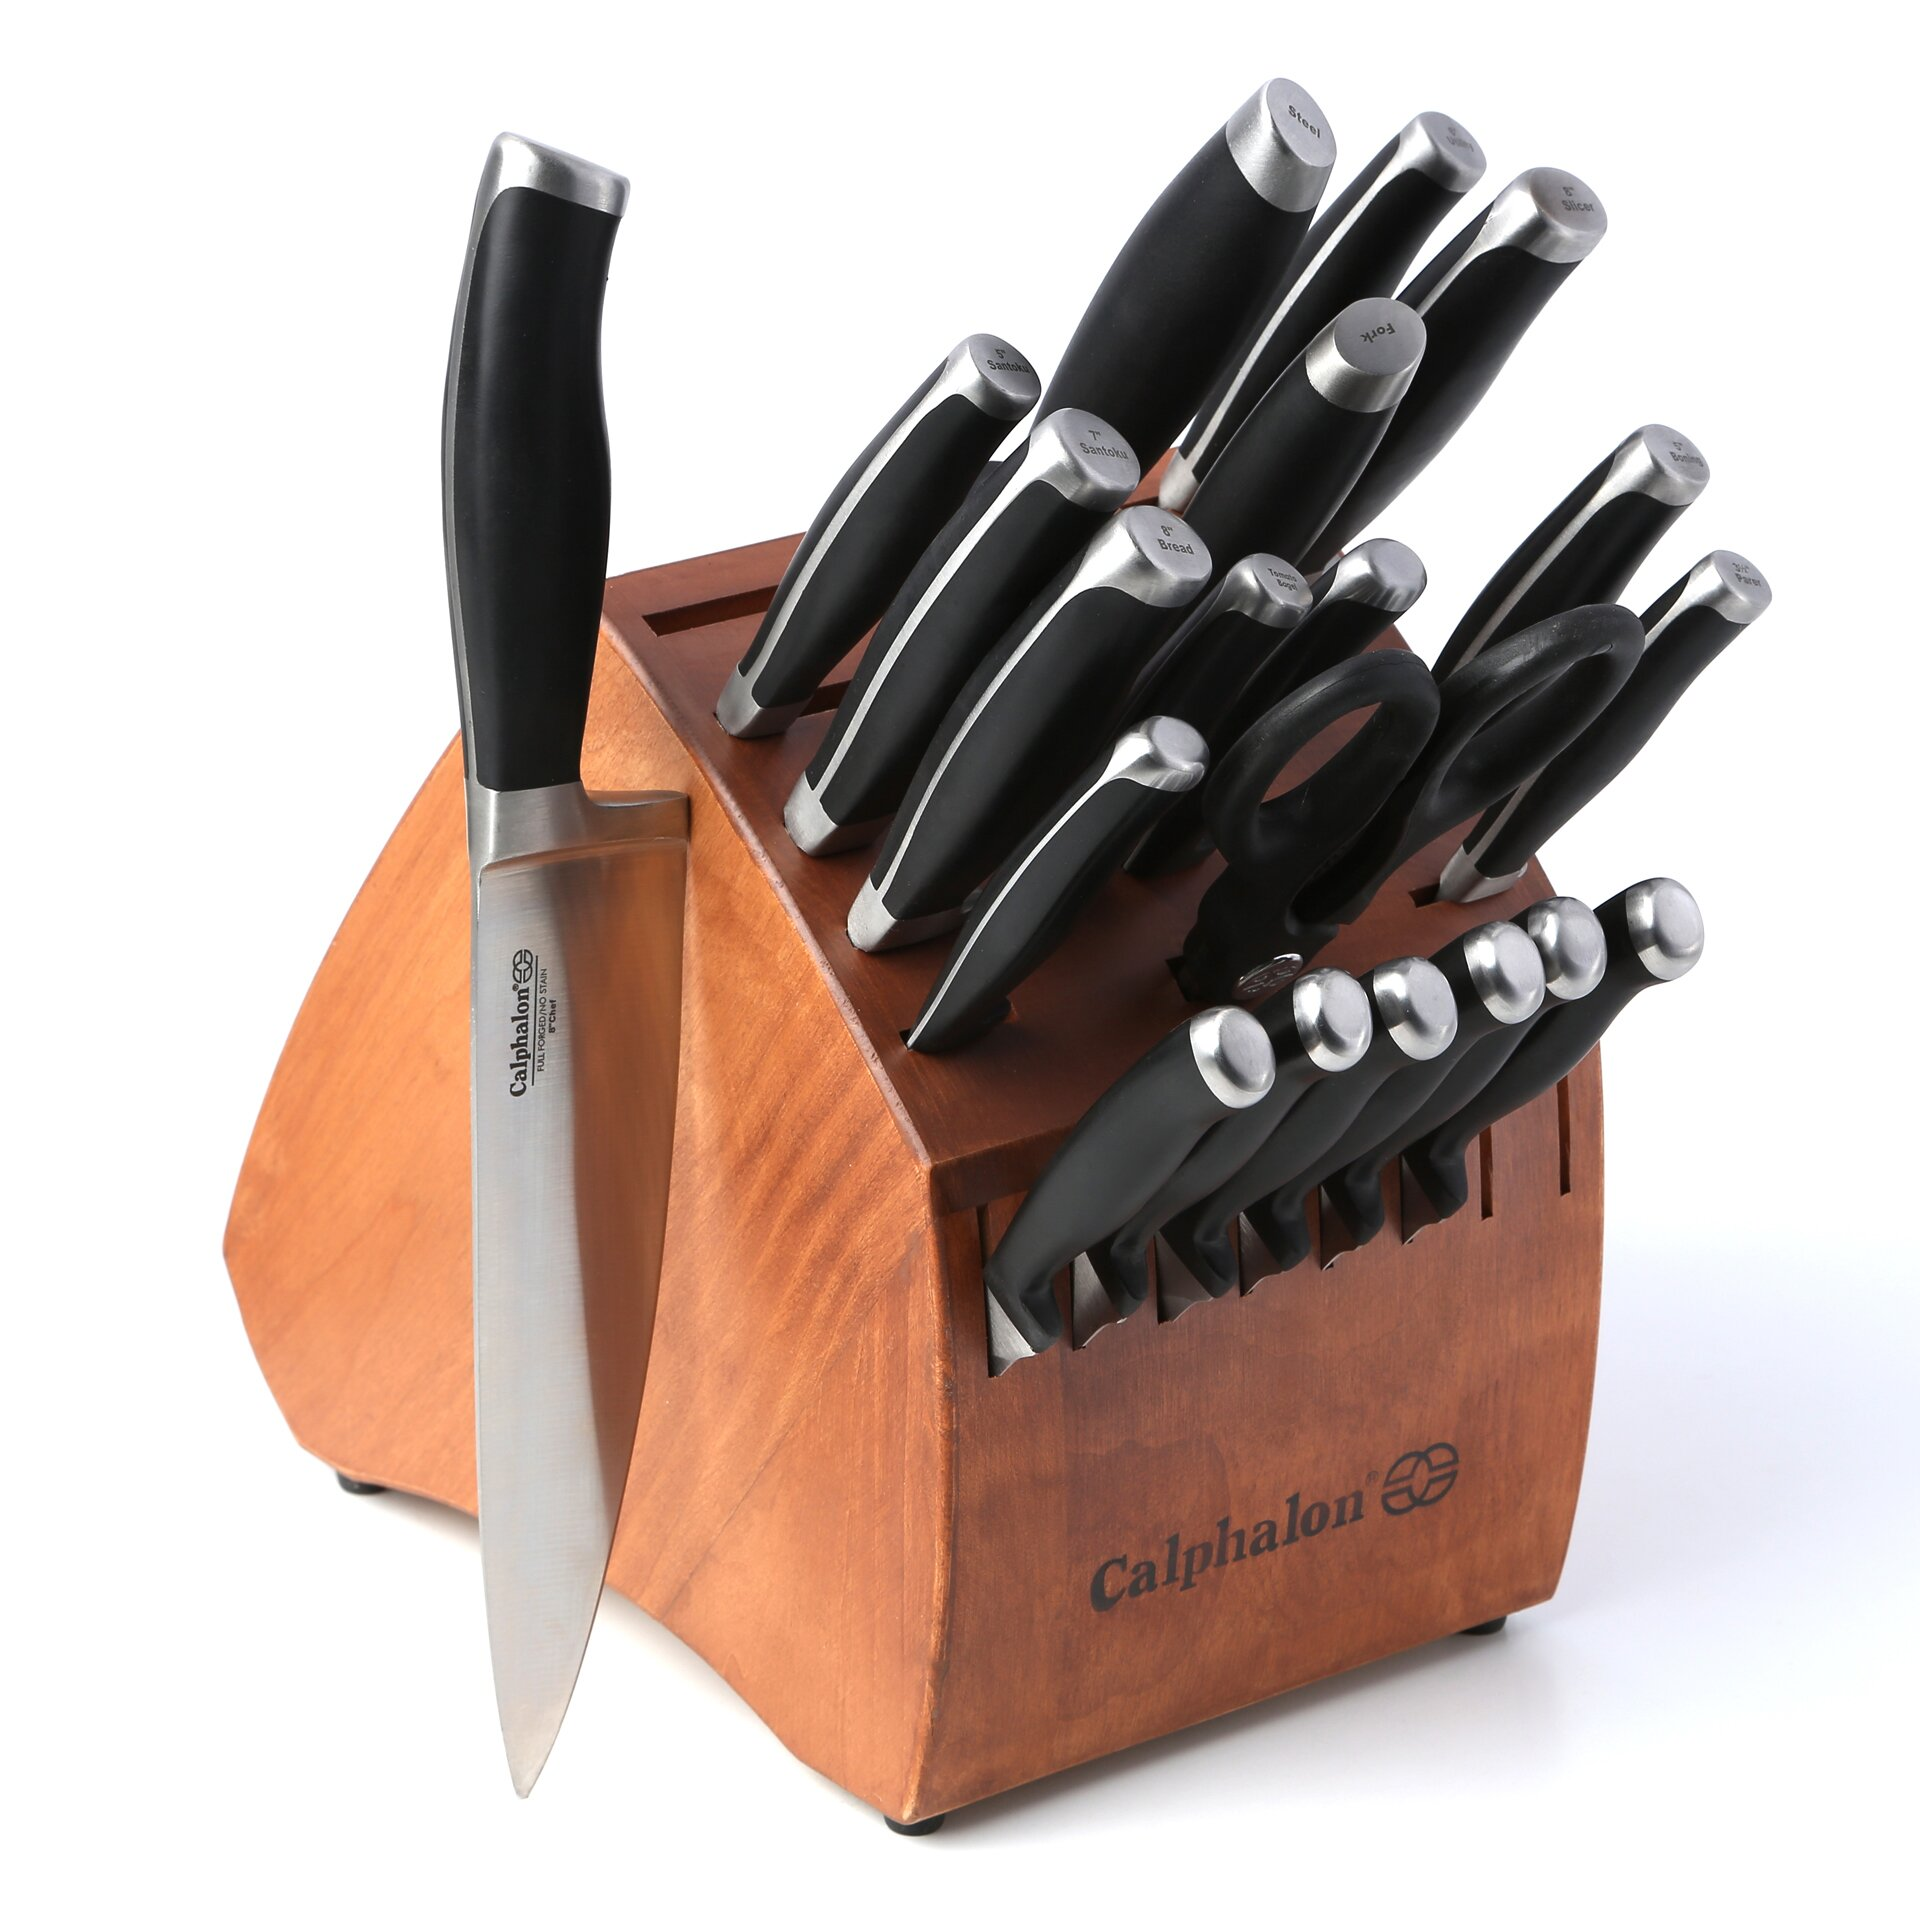 knives block set calphalon contemporary cutlery 21 piece knife block set